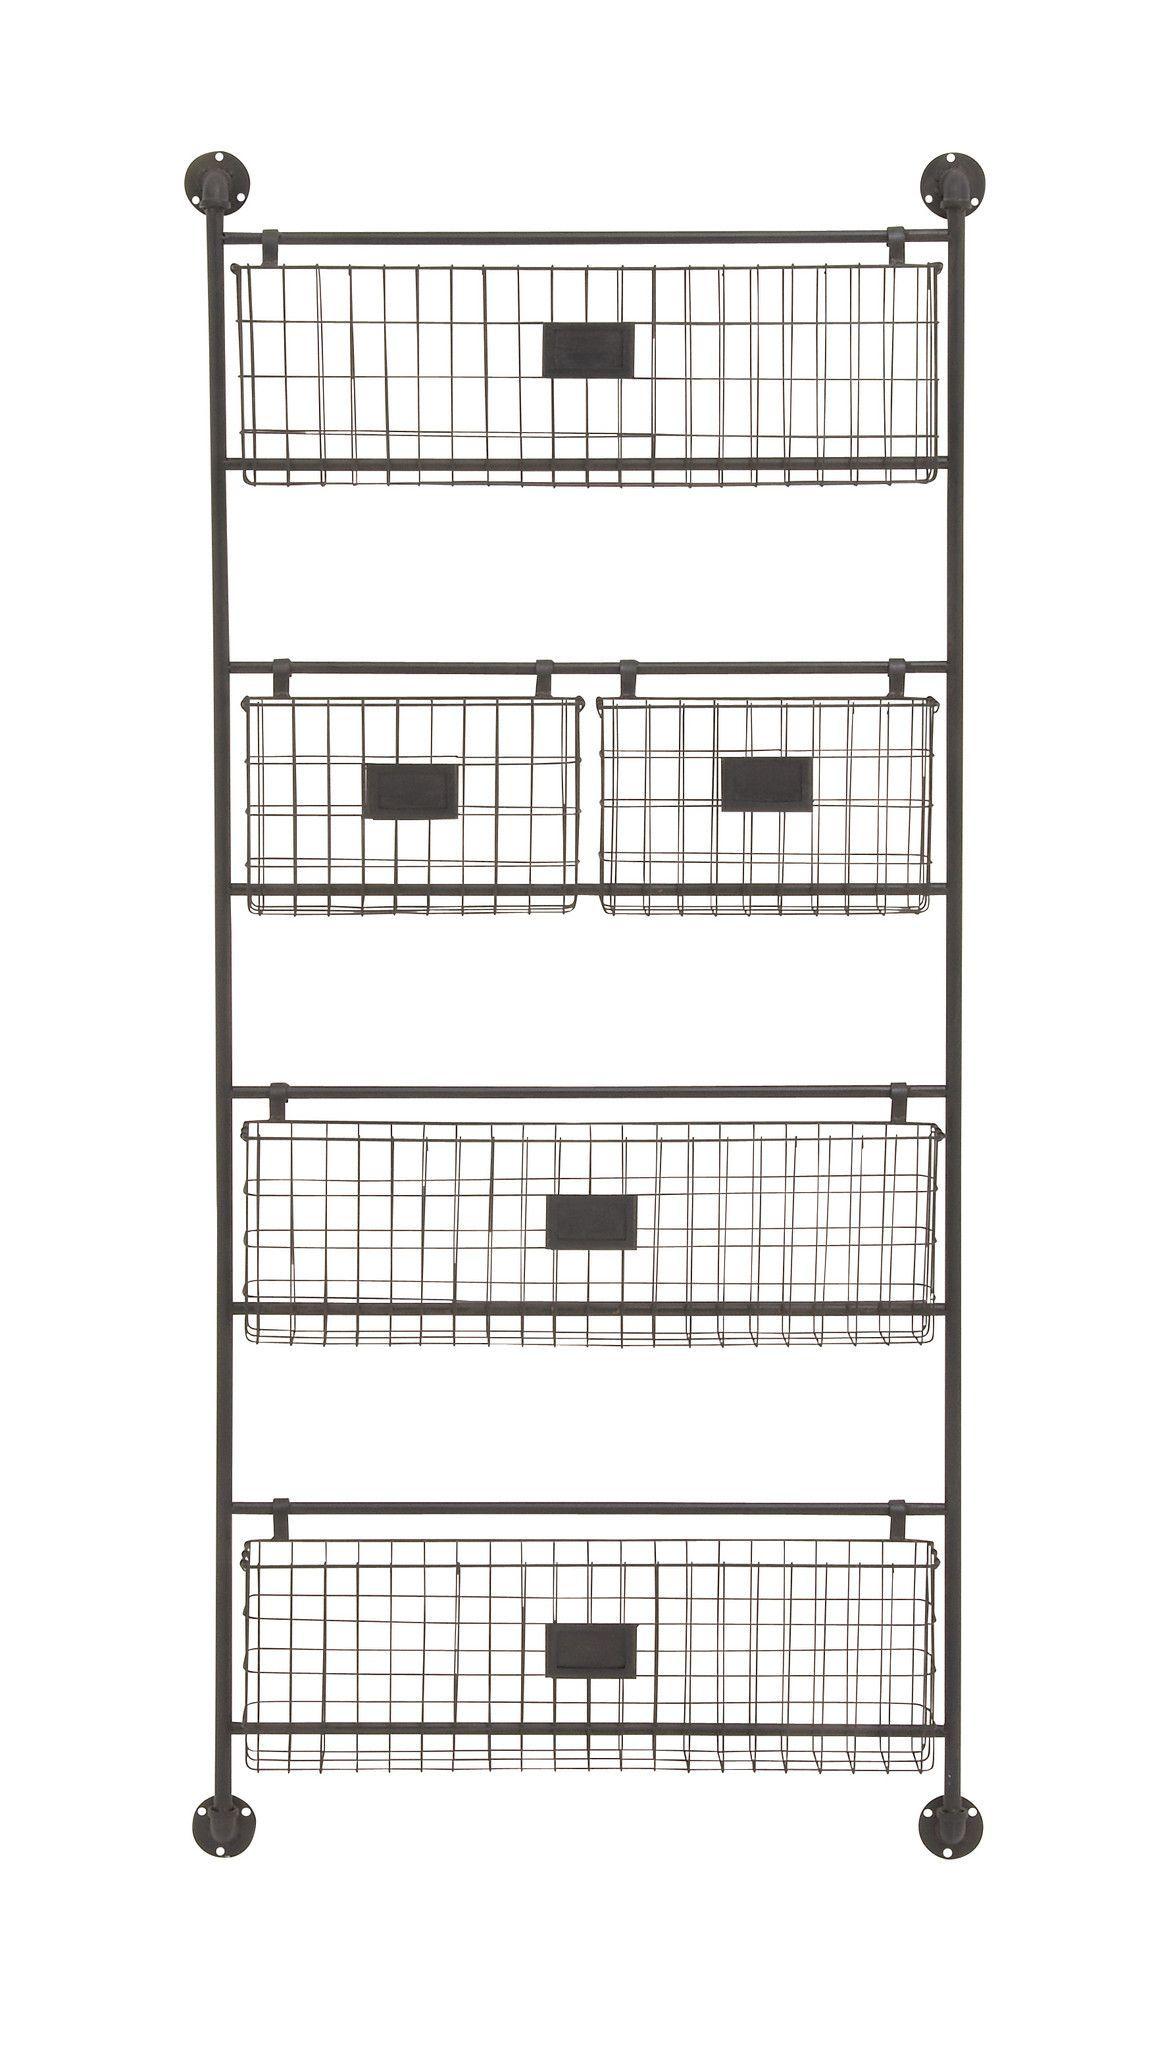 61 Large Black Metal Wall Shelf Basket Letter Organizer Industrial Look Baskets On Wall Vintage Boys Bedrooms Metal Wall Basket